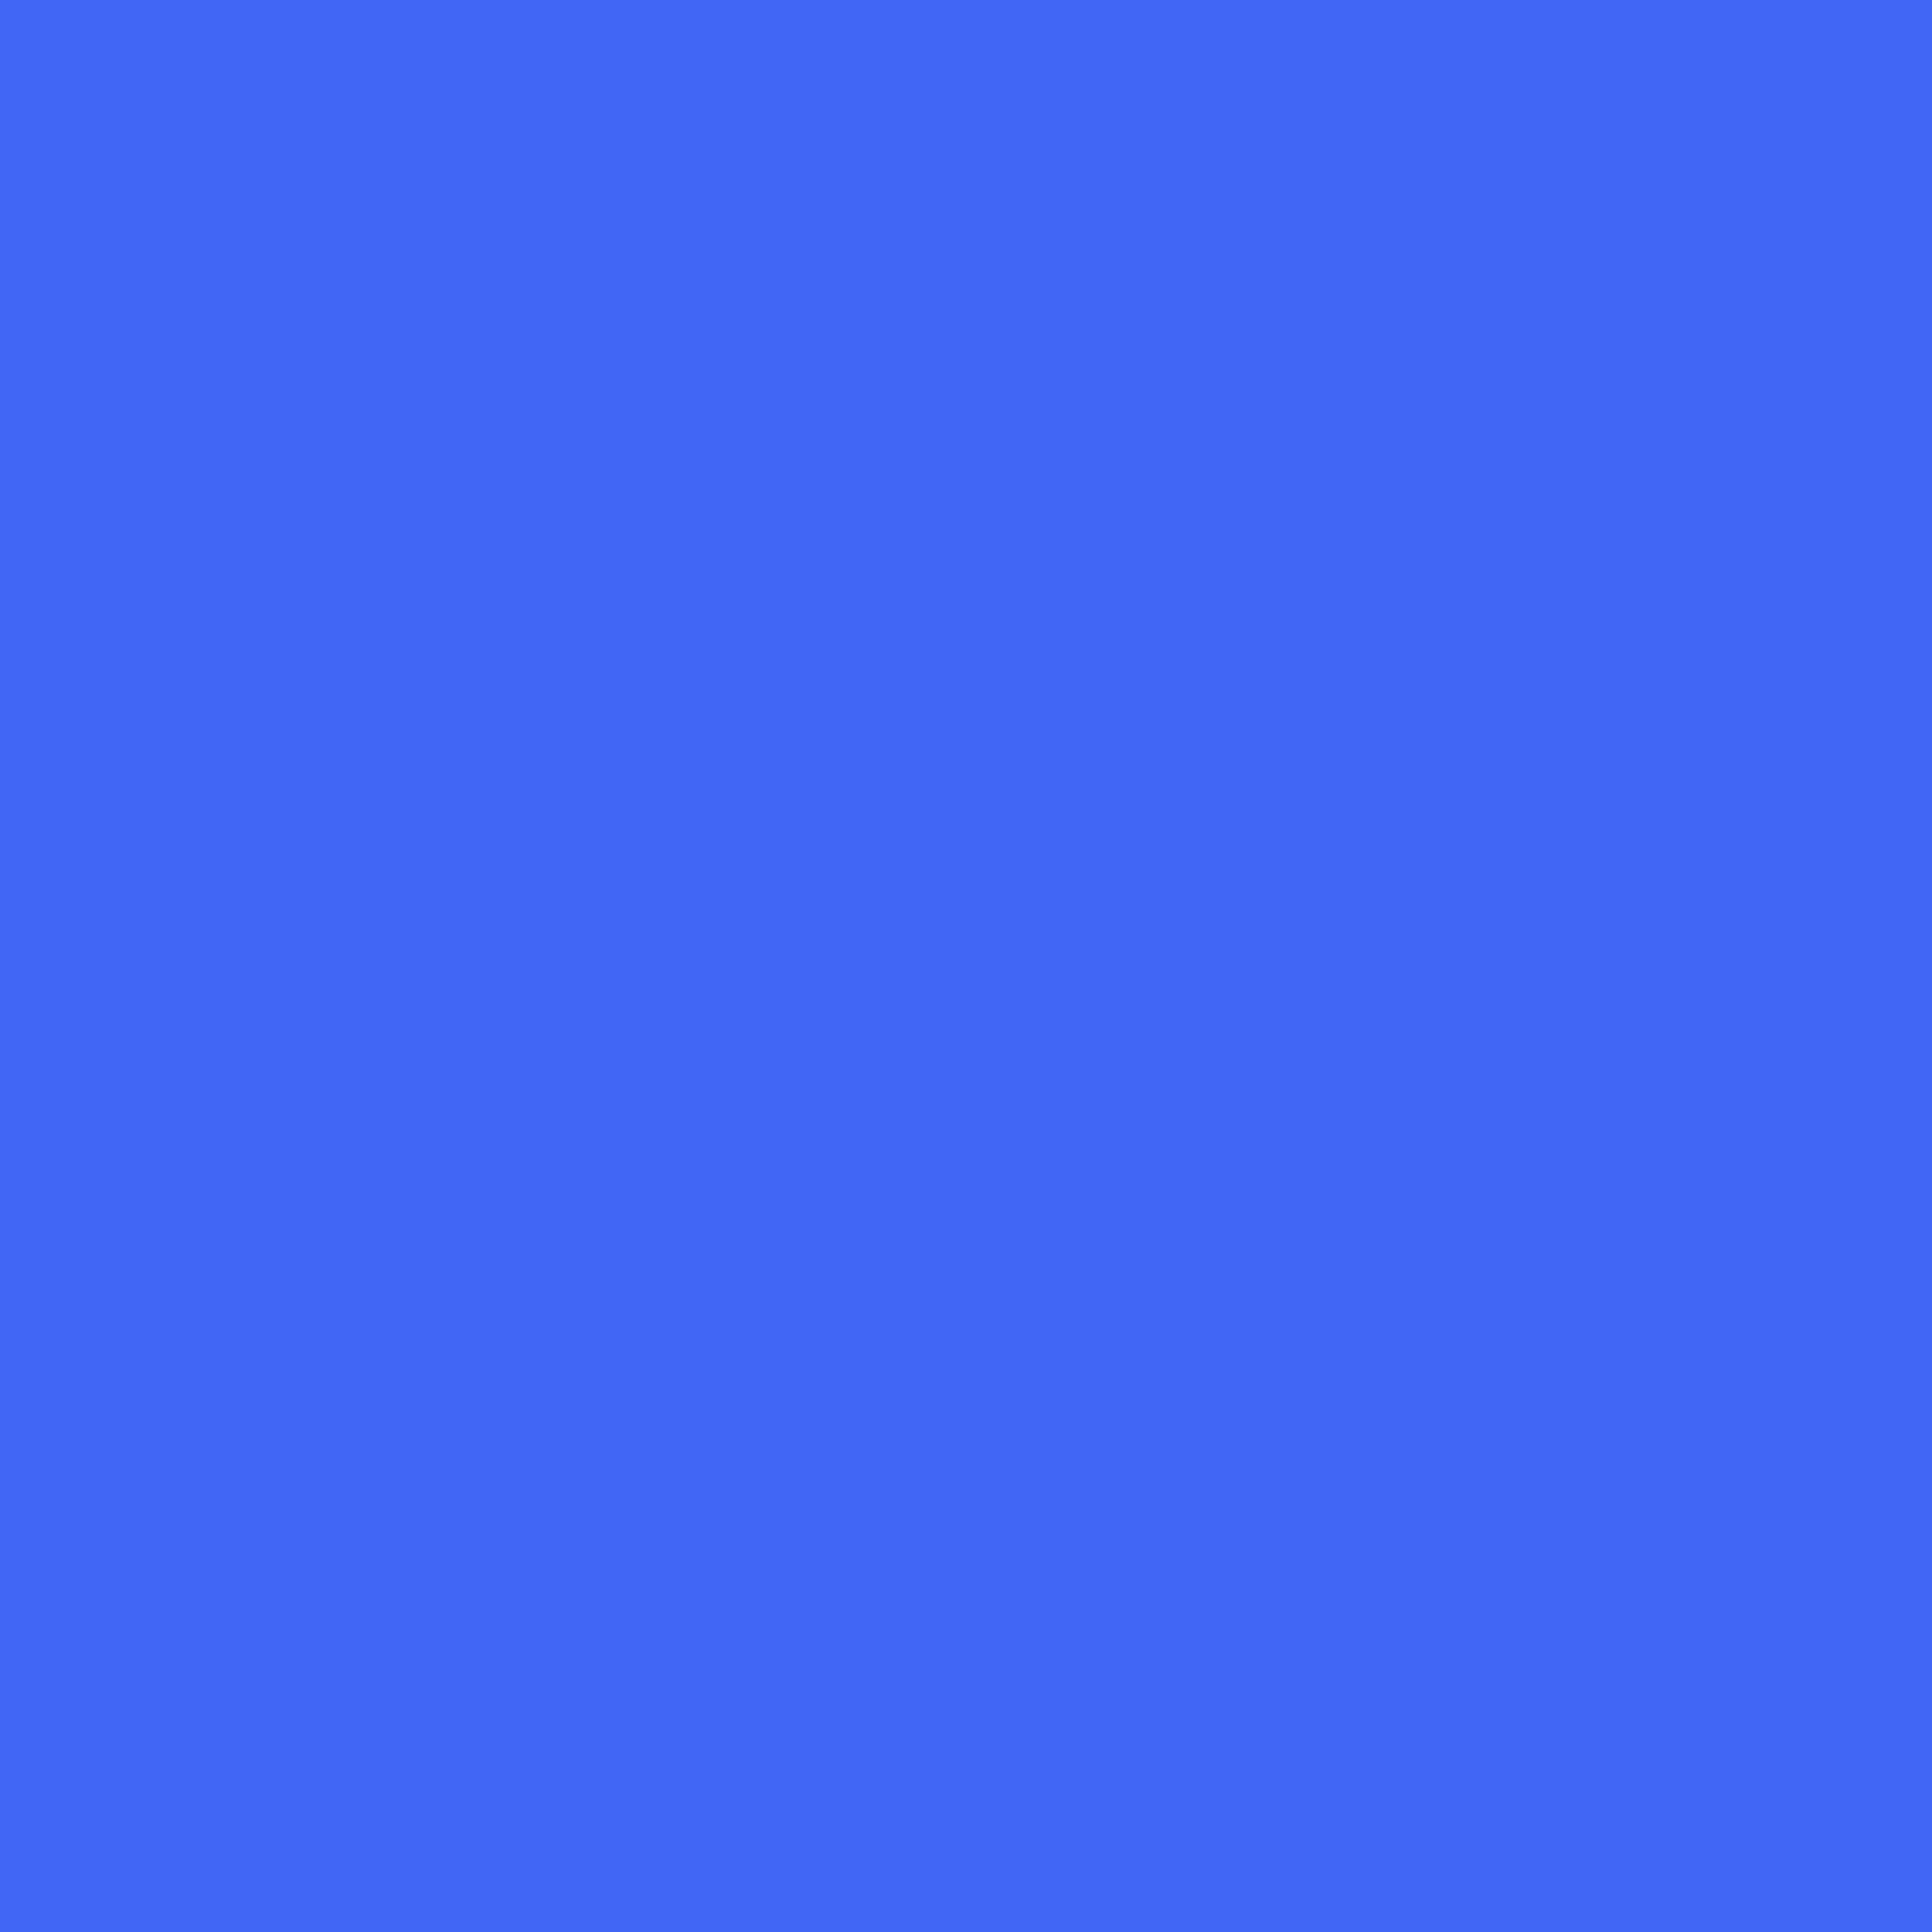 2732x2732 Ultramarine Blue Solid Color Background